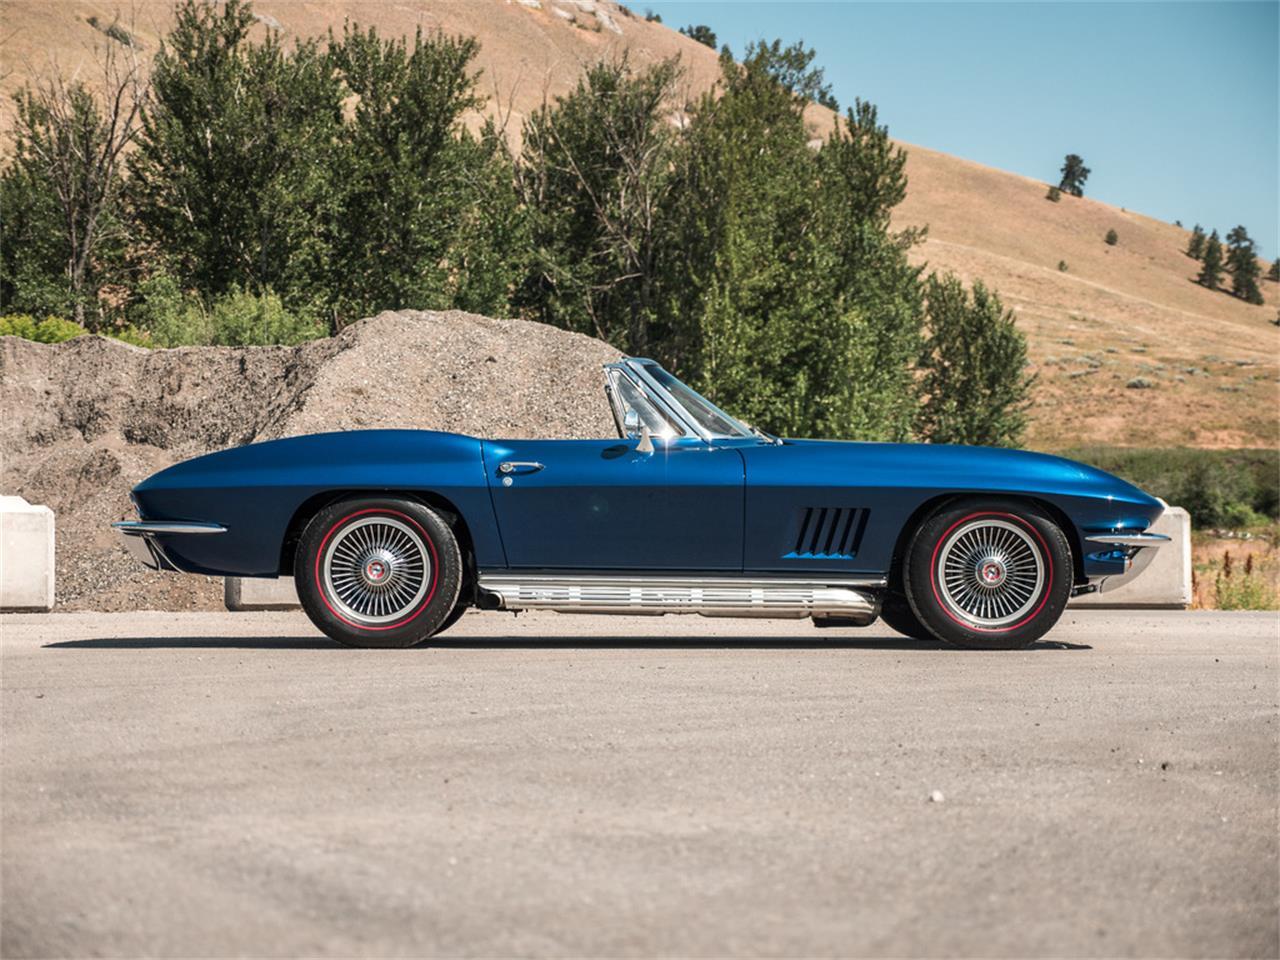 Large Picture of 1967 Corvette located in British Columbia - $107,123.00 - QH6N